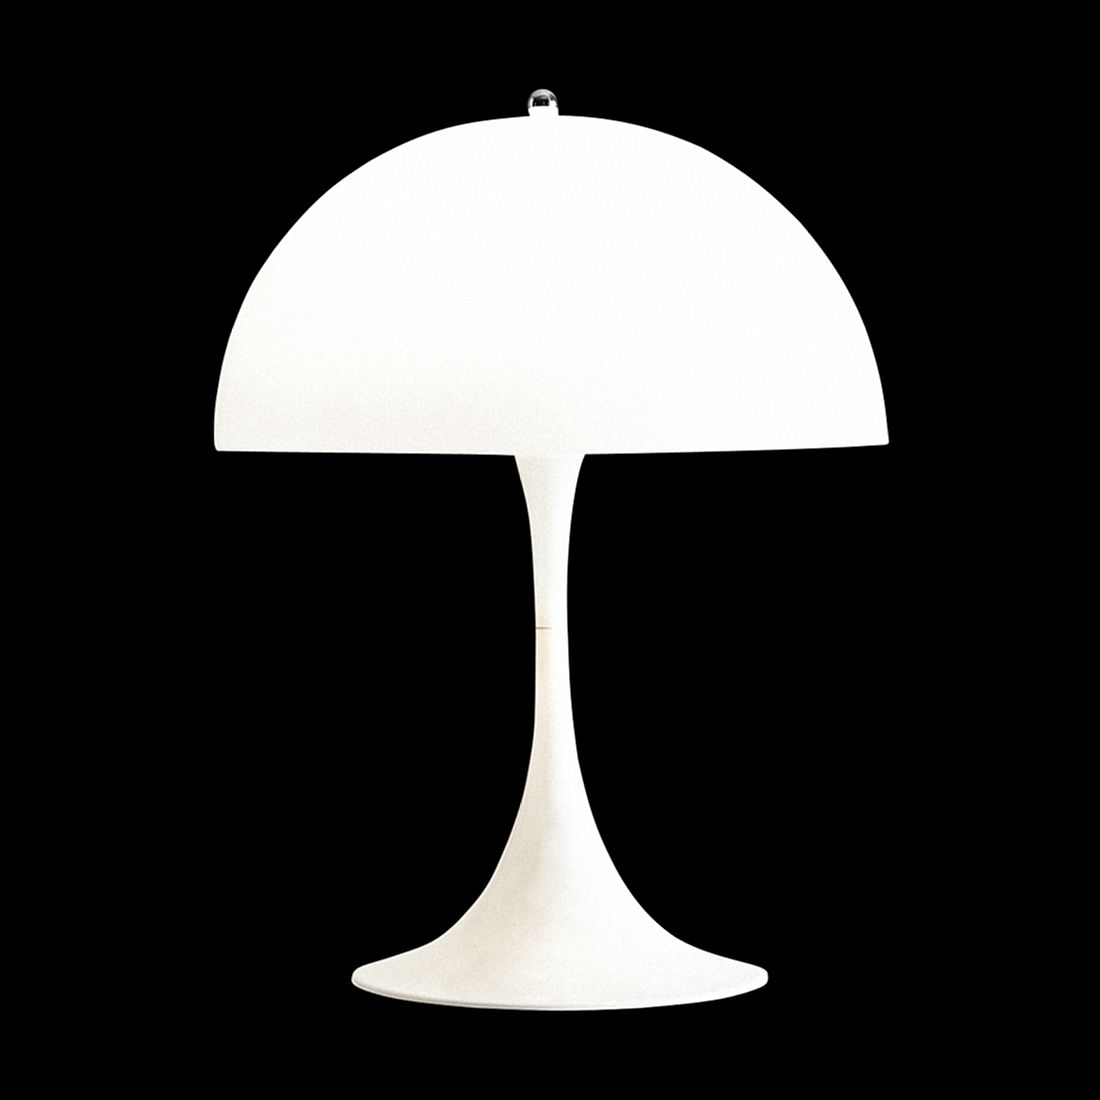 02 louis poulsen lighting google search light design icon pinterest light design and lights. Black Bedroom Furniture Sets. Home Design Ideas